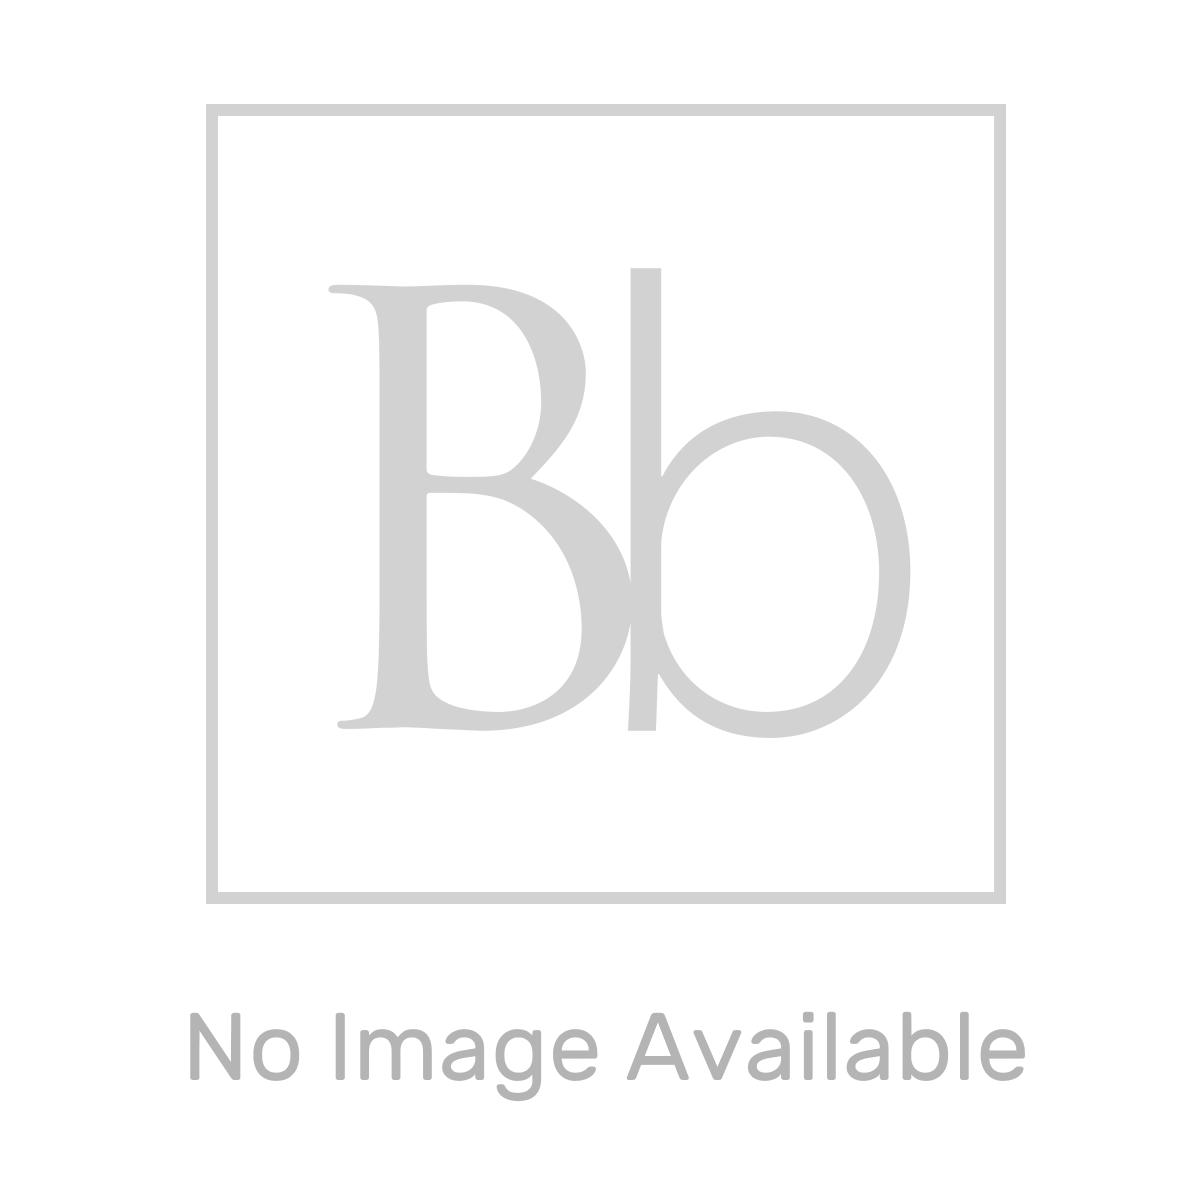 BTL Vema Flusso Chrome Bath Filler